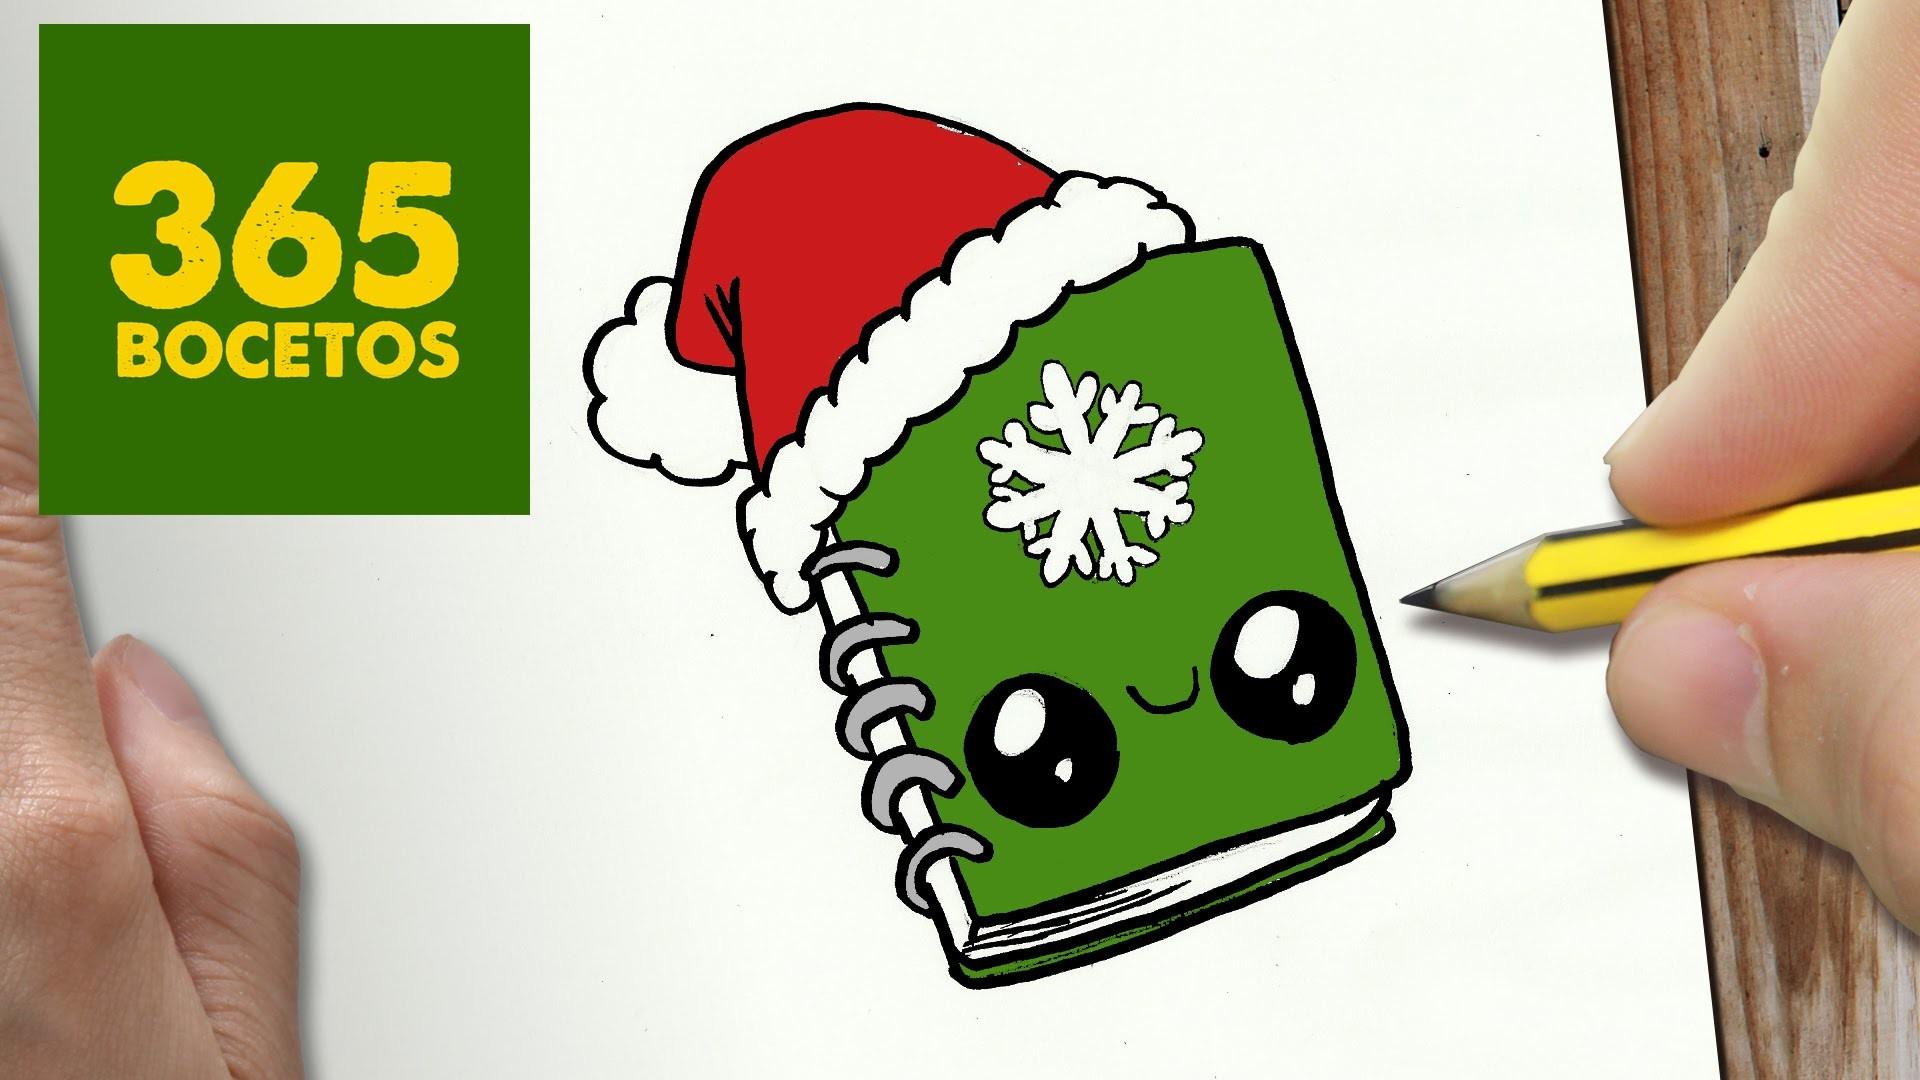 Como Dibujar Un Cuaderno Para Navidad Paso A Paso Dibujos: COMO DIBUJAR UN CUADERNO PARA NAVIDAD PASO A PASO: Dibujos